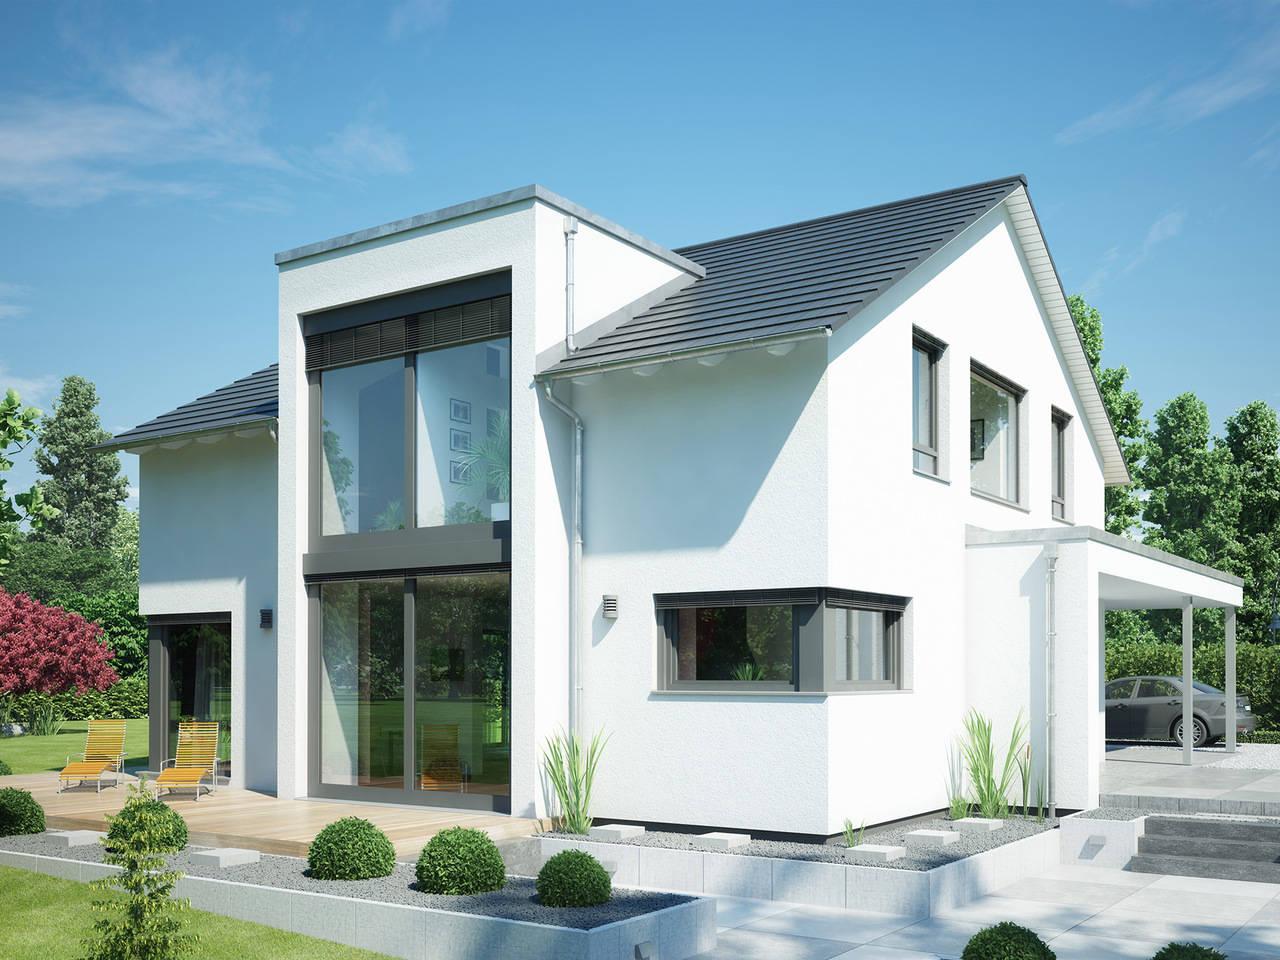 Concept-M Köln Mod-Classic - Architektenhaus Variante B